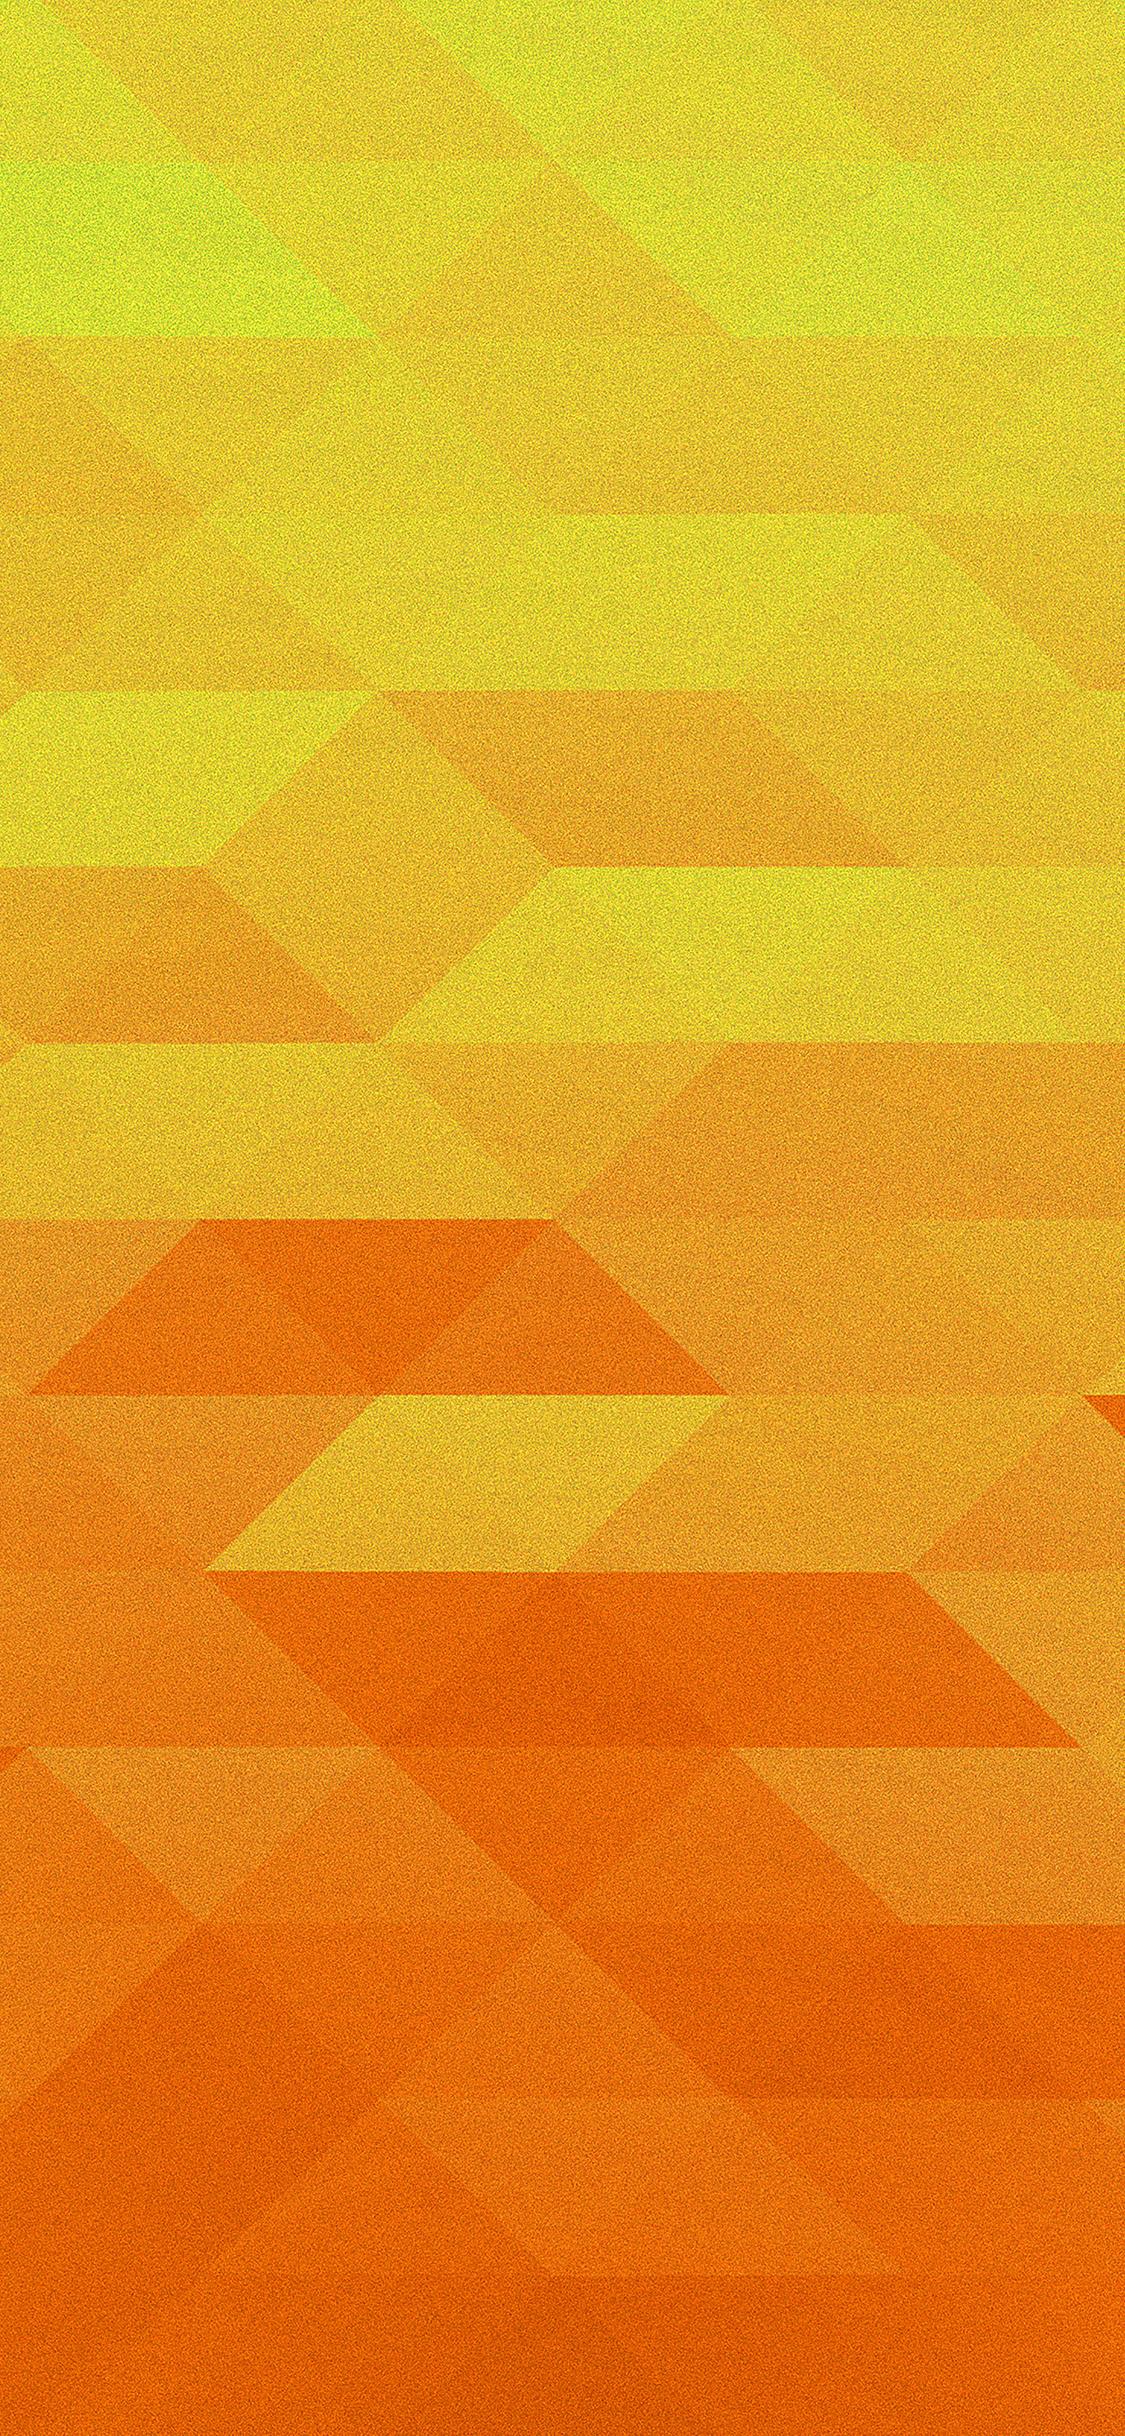 iPhoneXpapers.com-Apple-iPhone-wallpaper-va38-orange-yellow-patterns